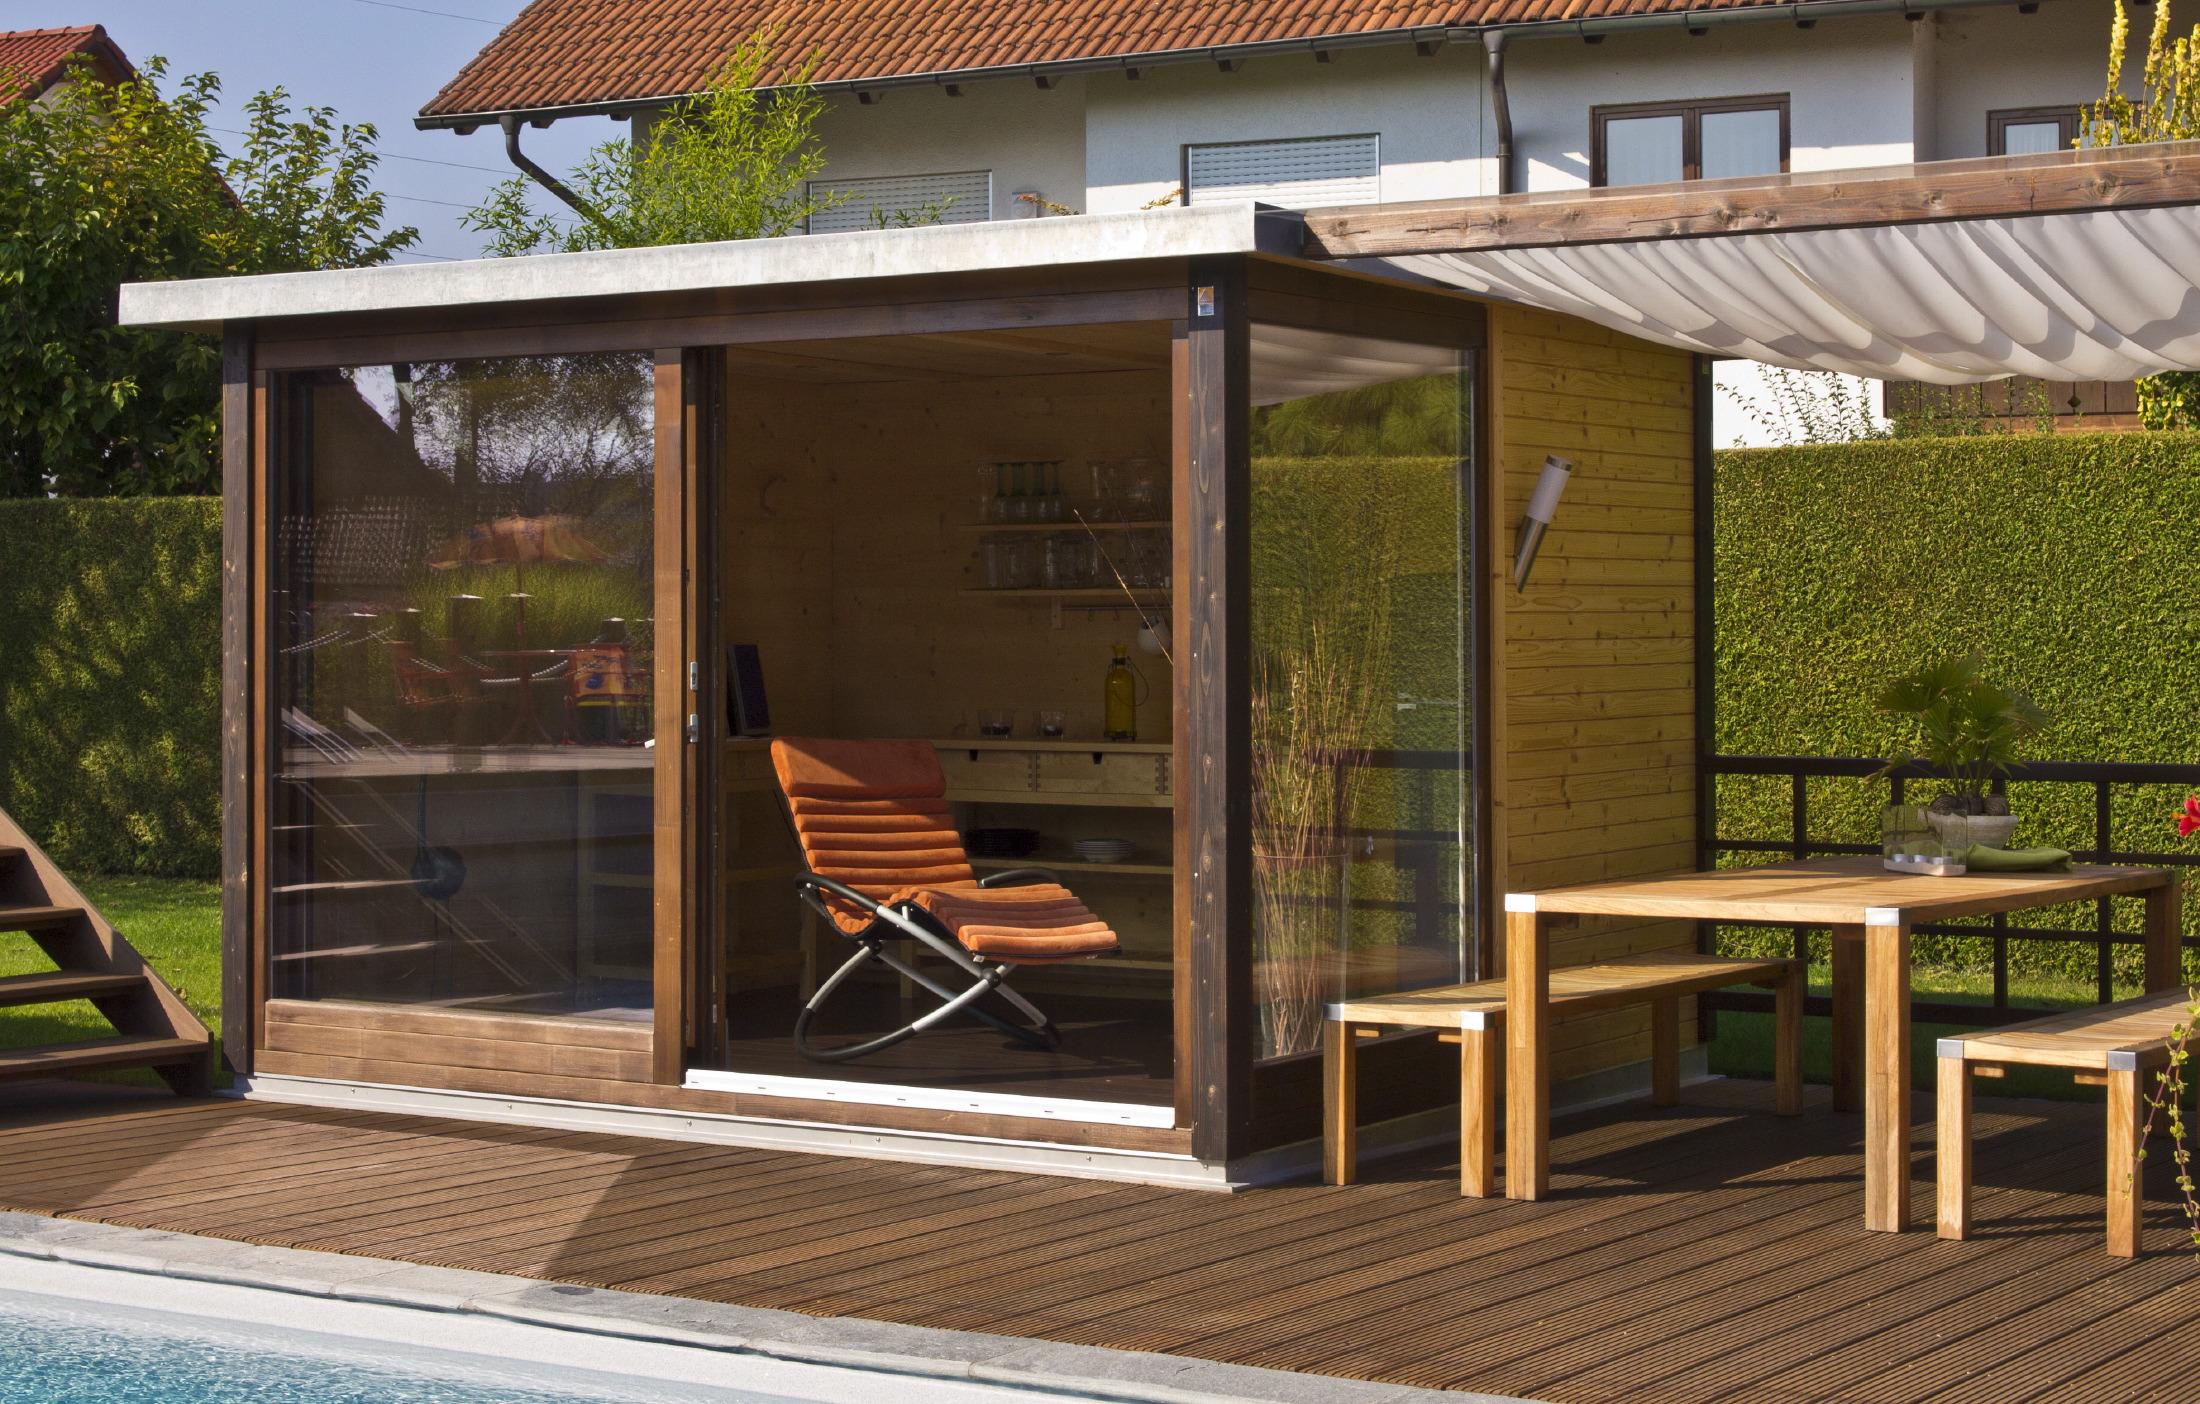 gartenhaus cube my blog. Black Bedroom Furniture Sets. Home Design Ideas